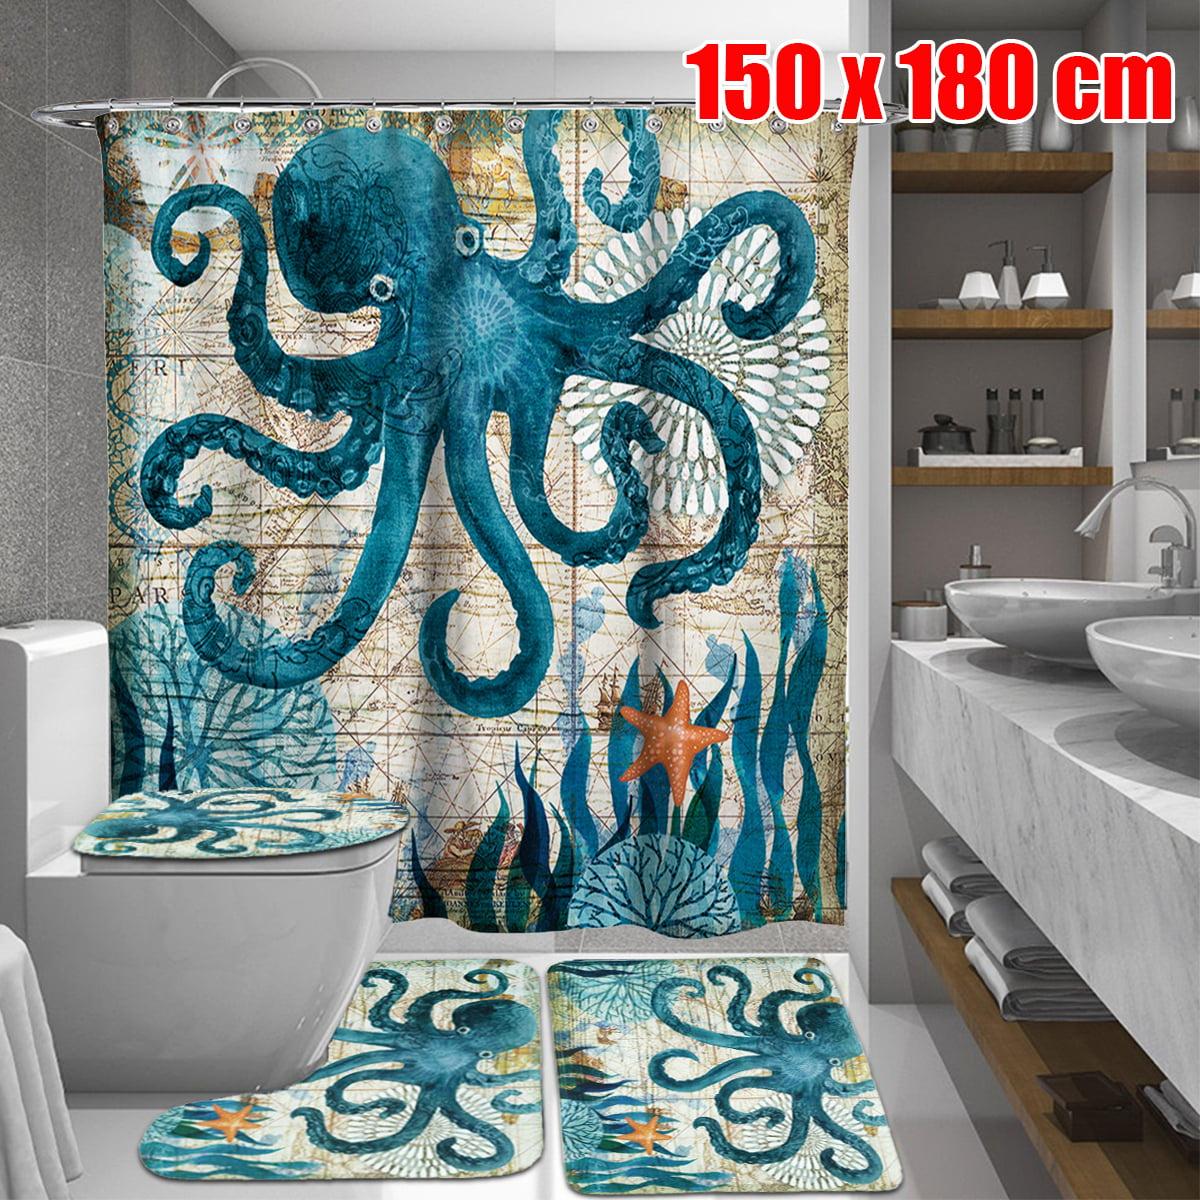 Octopus Design Polyester Bathroom Waterproof Fabric Shower